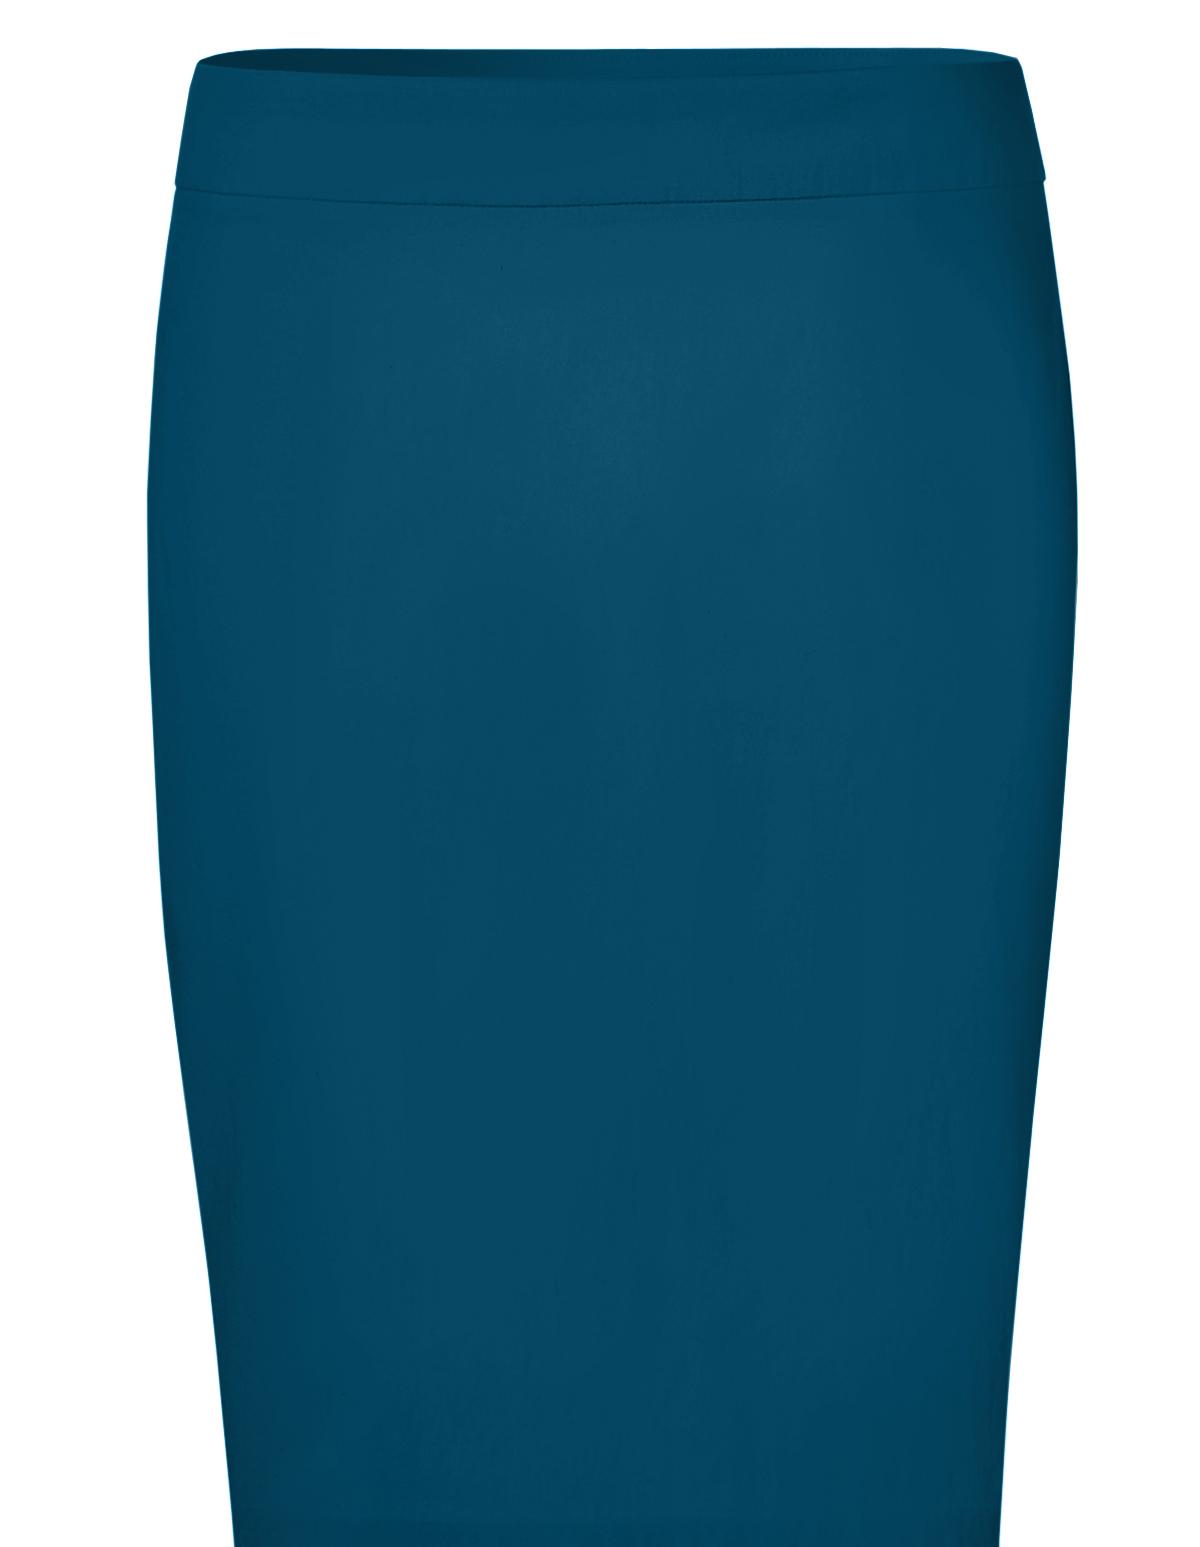 turquoise signature pencil skirt cleo